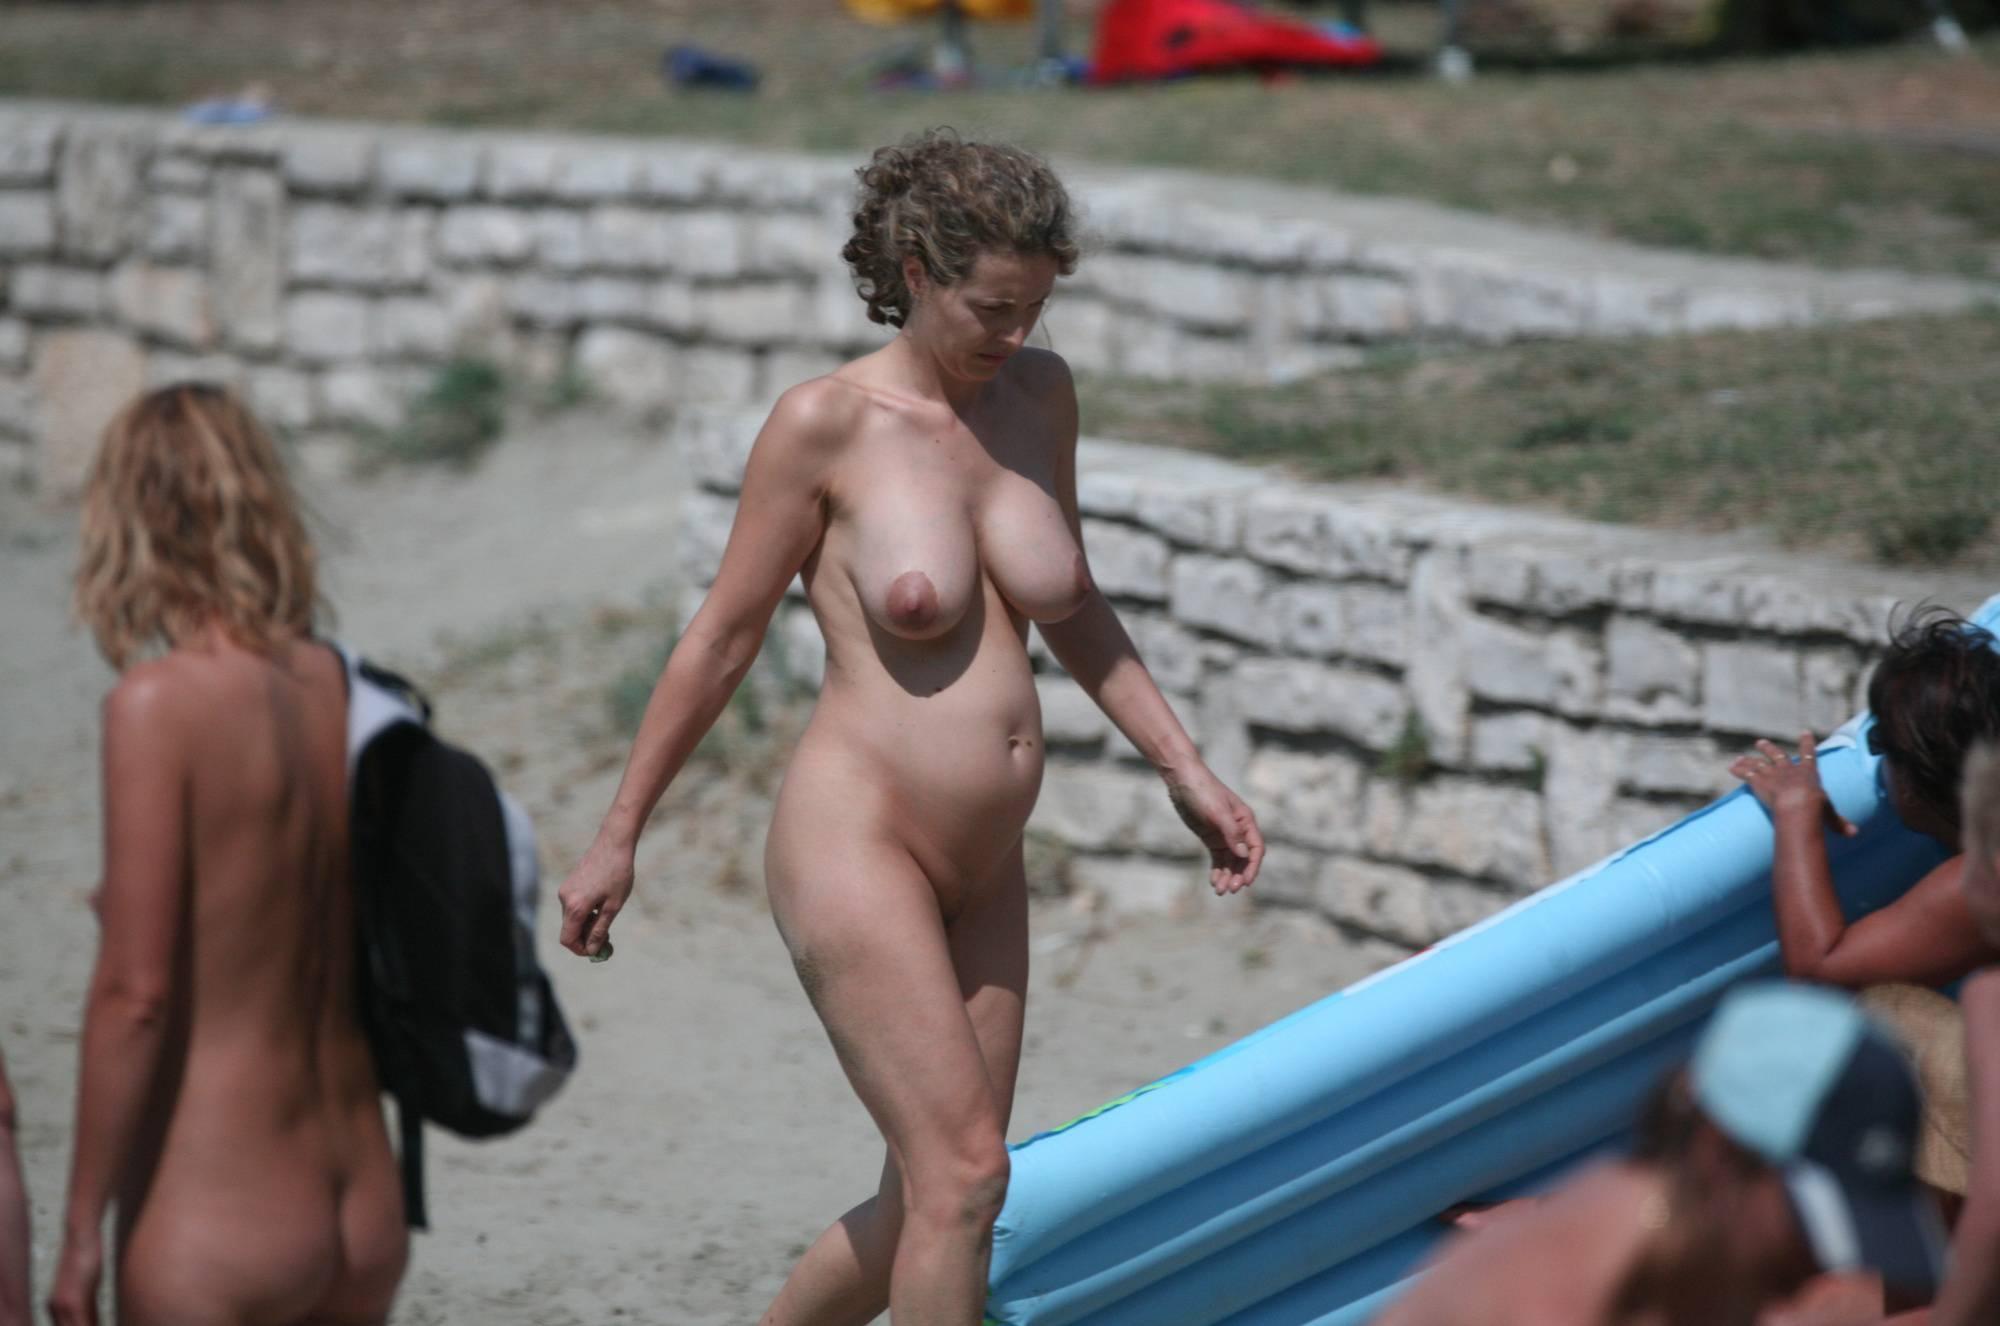 Adult Shore Sand Beaches - 3